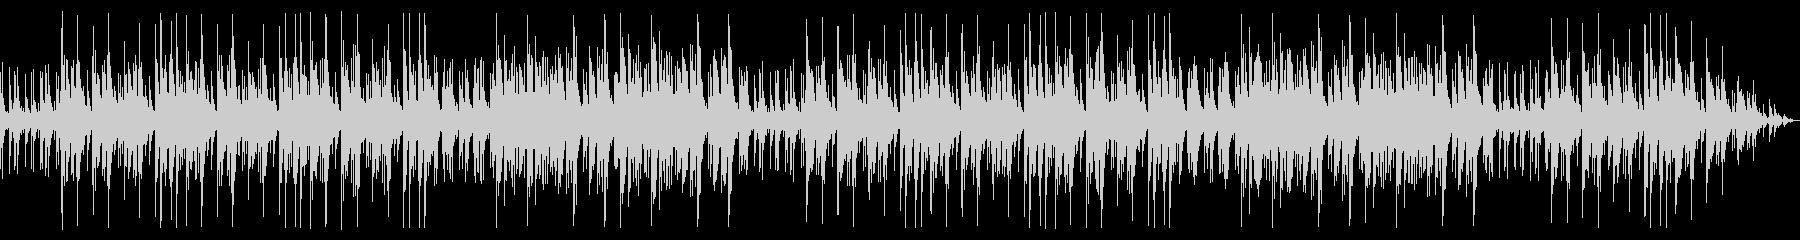 Ainu-type string instruments quiet night's unreproduced waveform